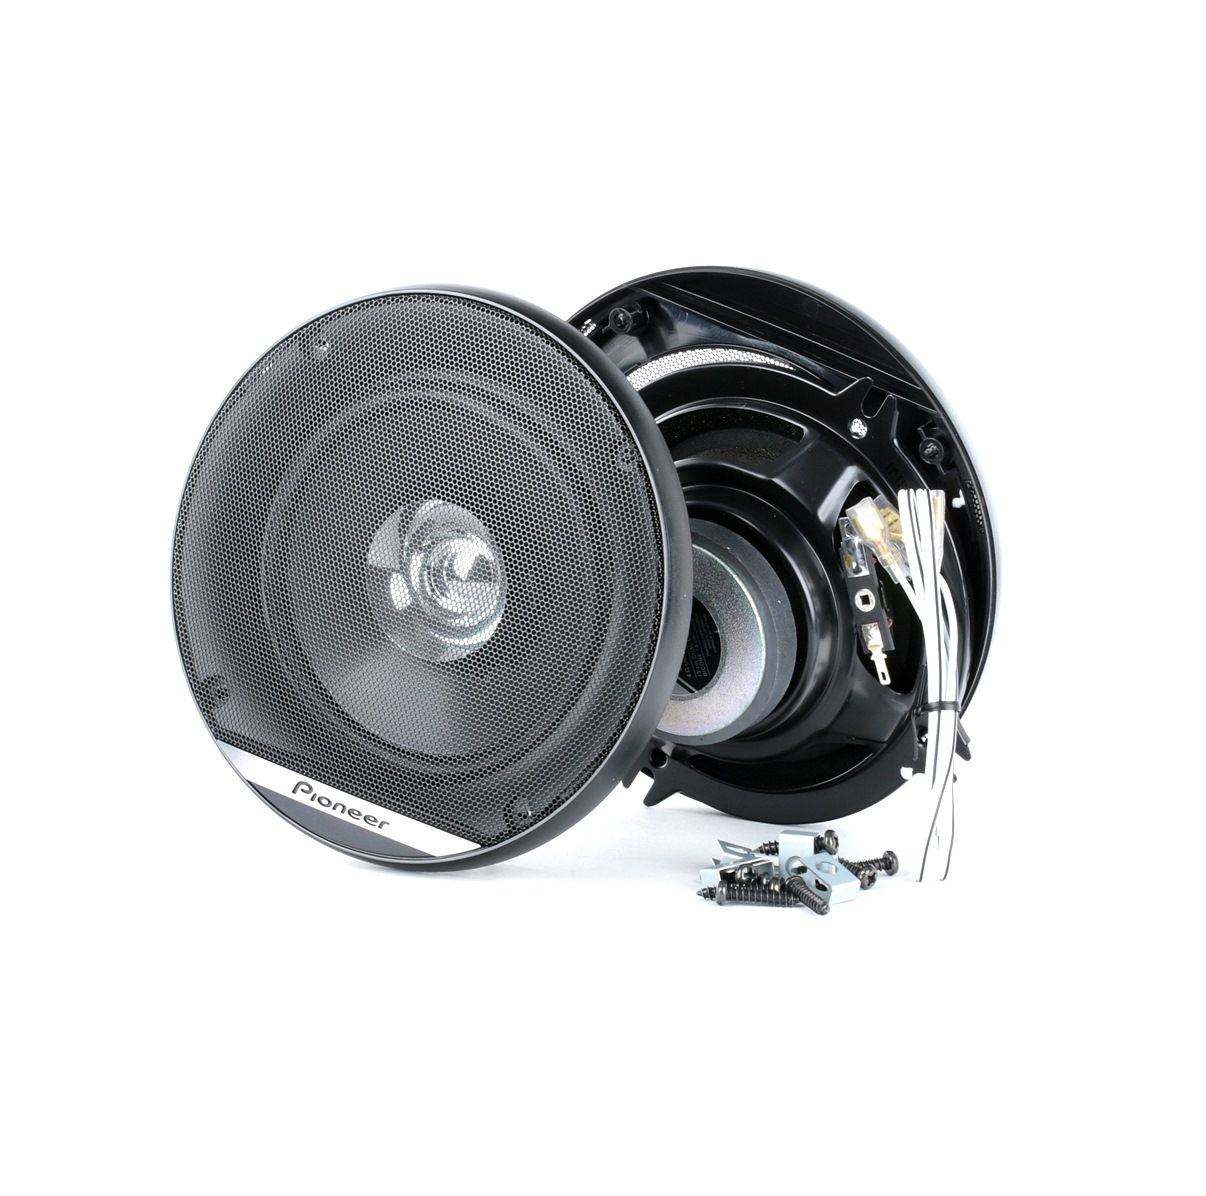 Lautsprecher PIONEER TS-G1310F Bewertung